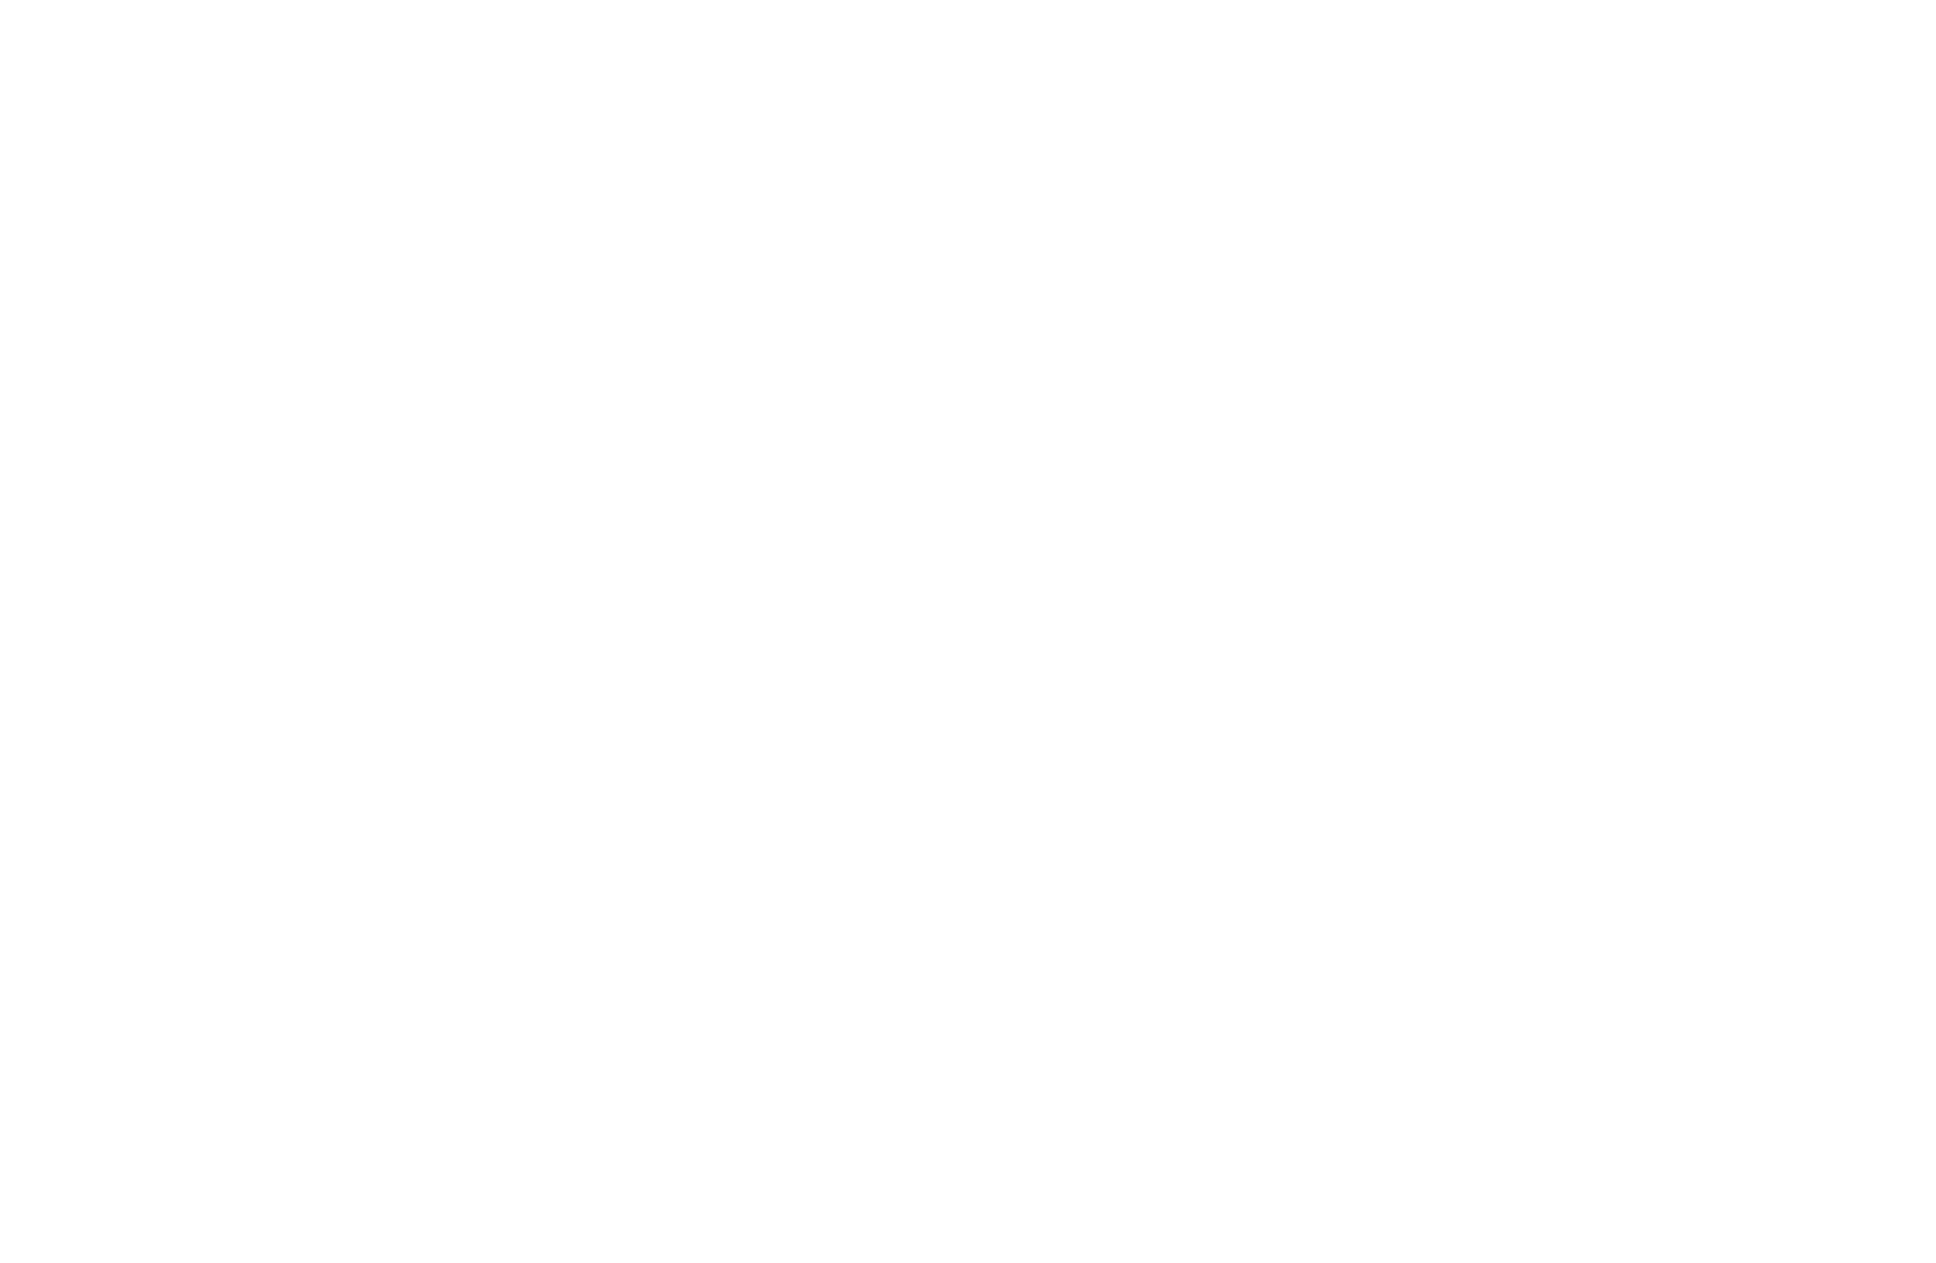 Bowery Film Festival Best Experimental Film Spring 2019